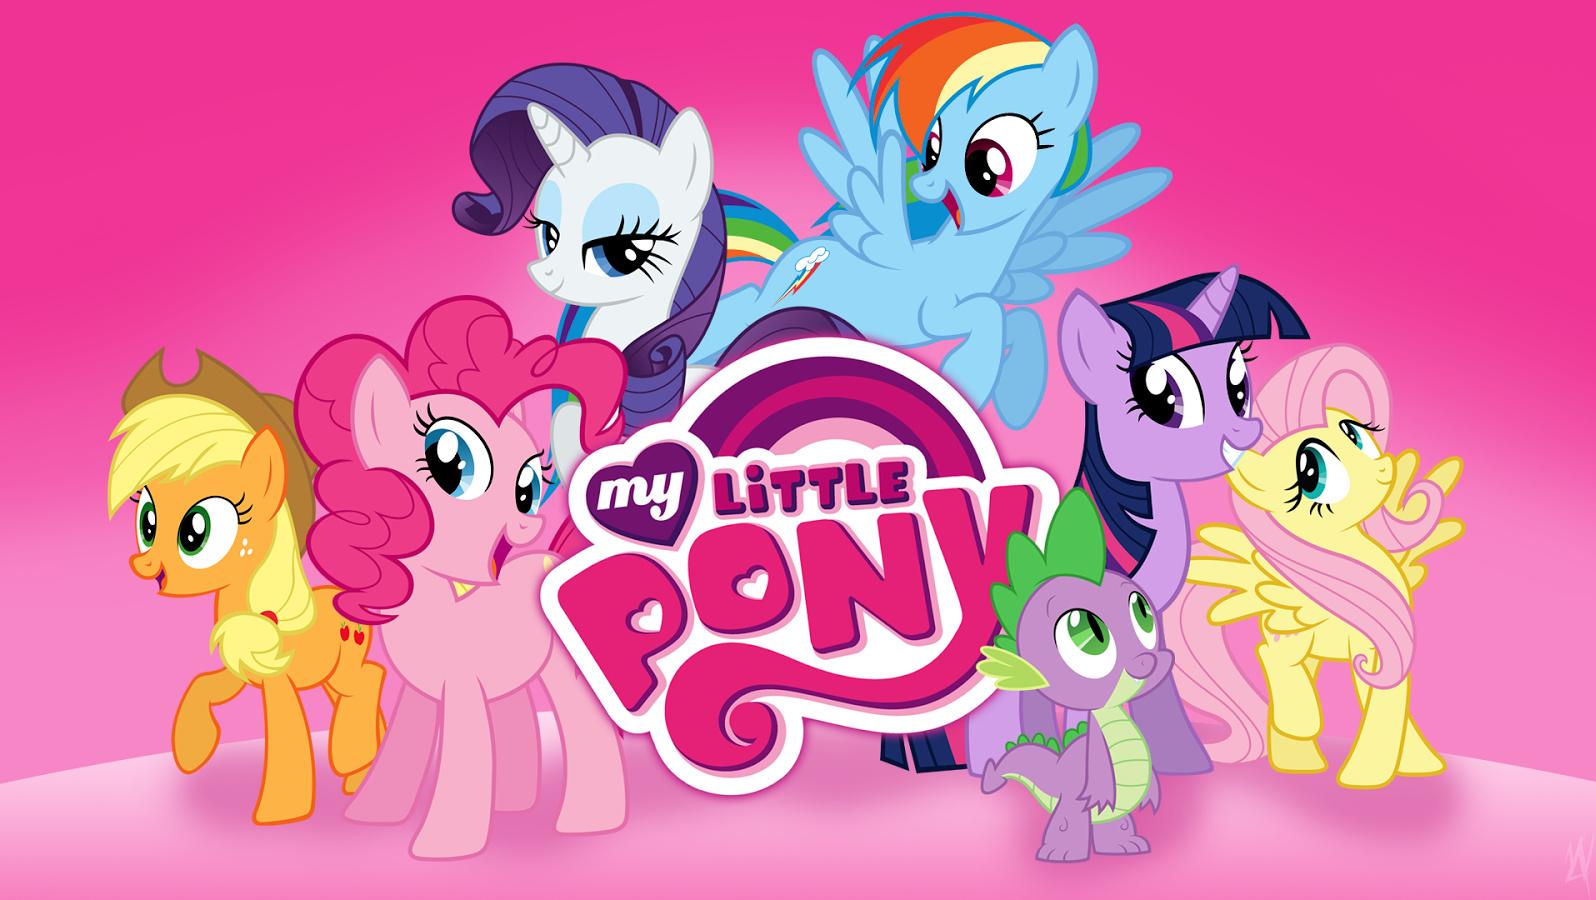 my little pony friendship is magic typewriter monkey